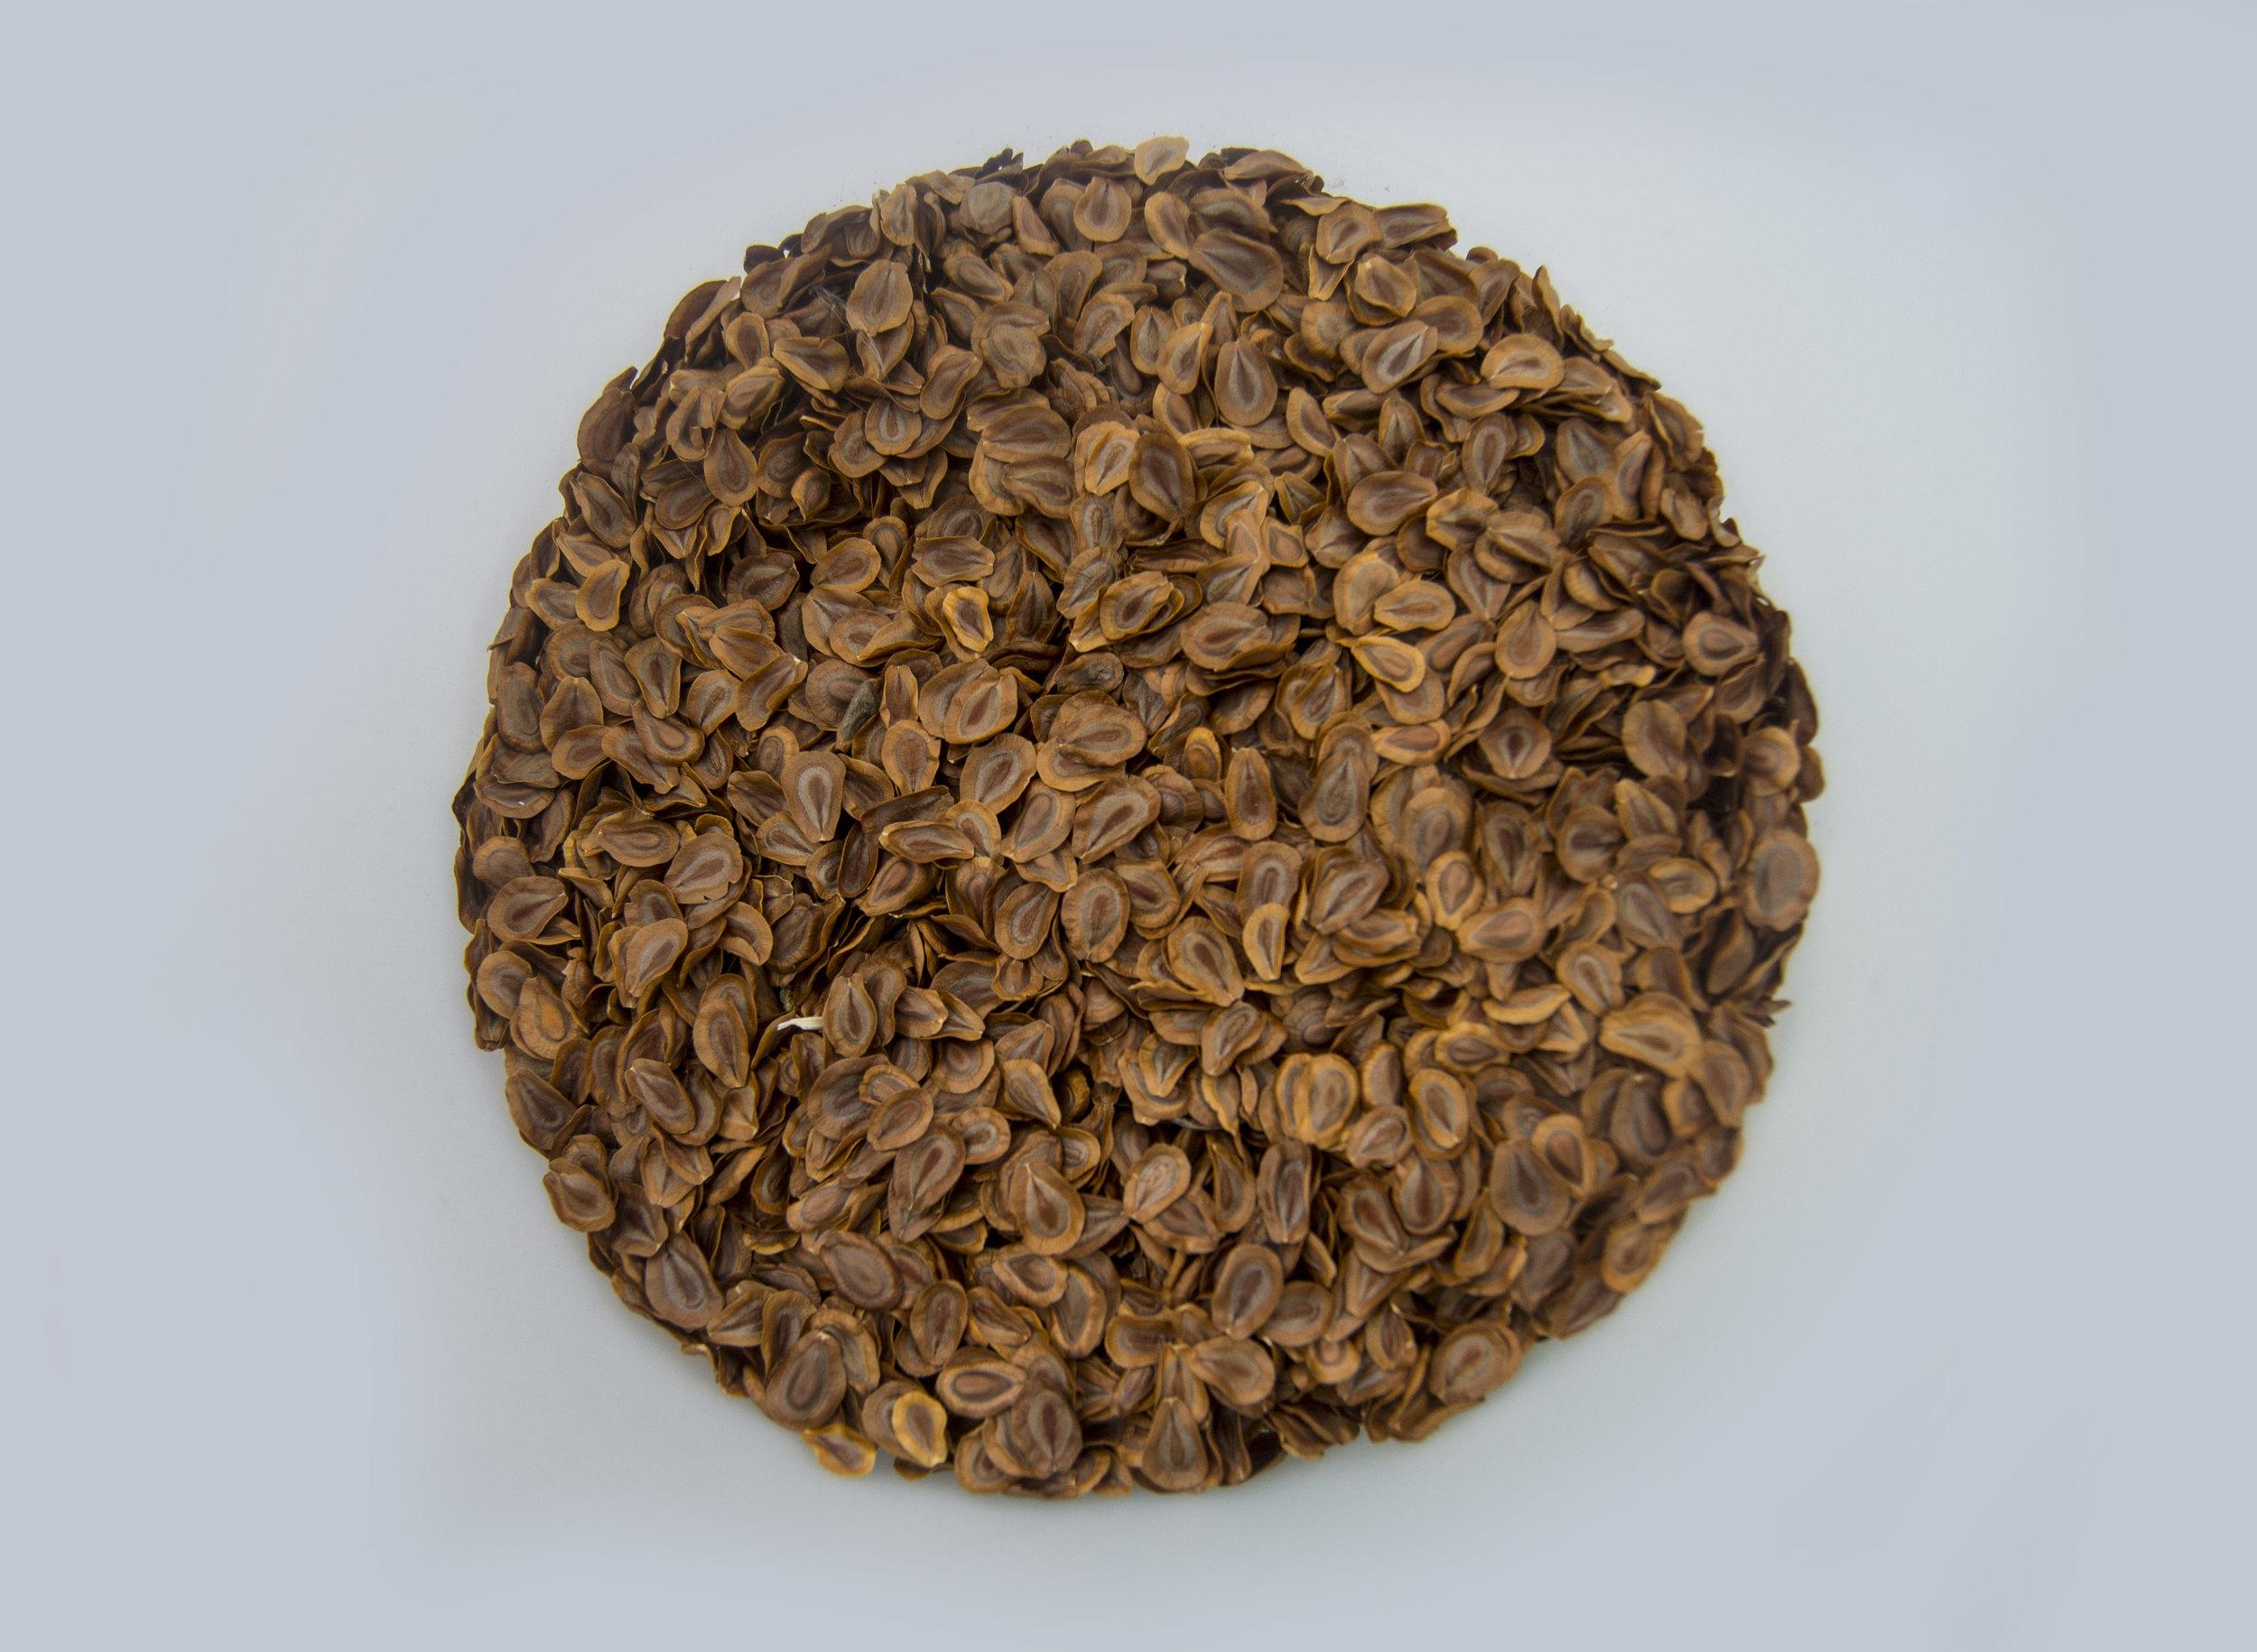 Milkweed seed for seed bombs